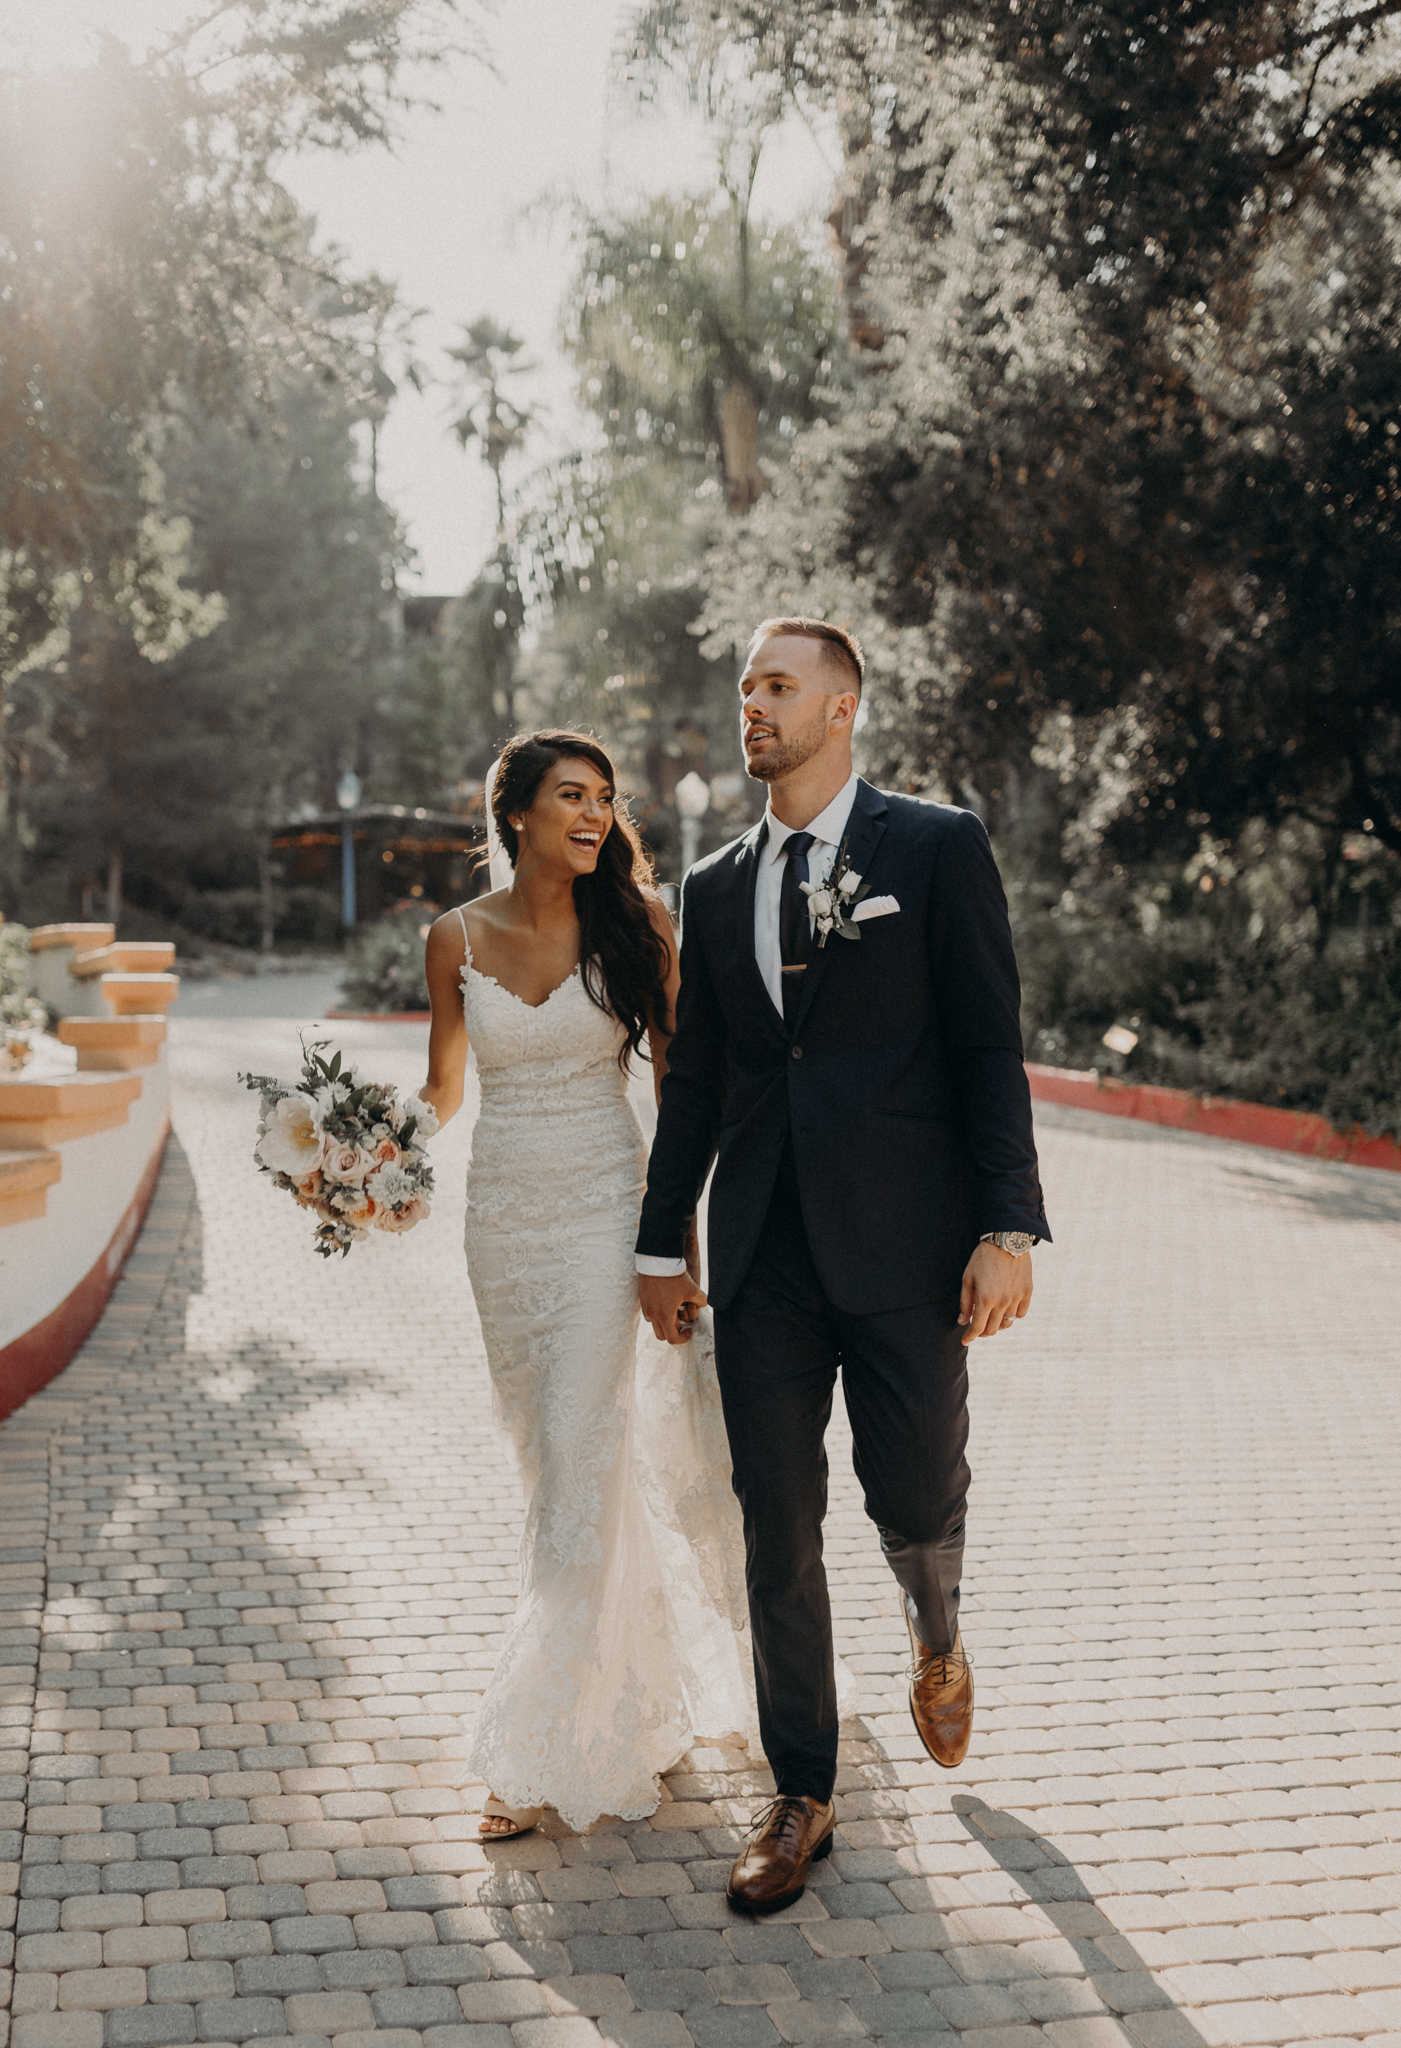 Isaiah + Taylor Photography - Rancho Las Lomas Wedding, Los Angeles Wedding Photographer-123.jpg